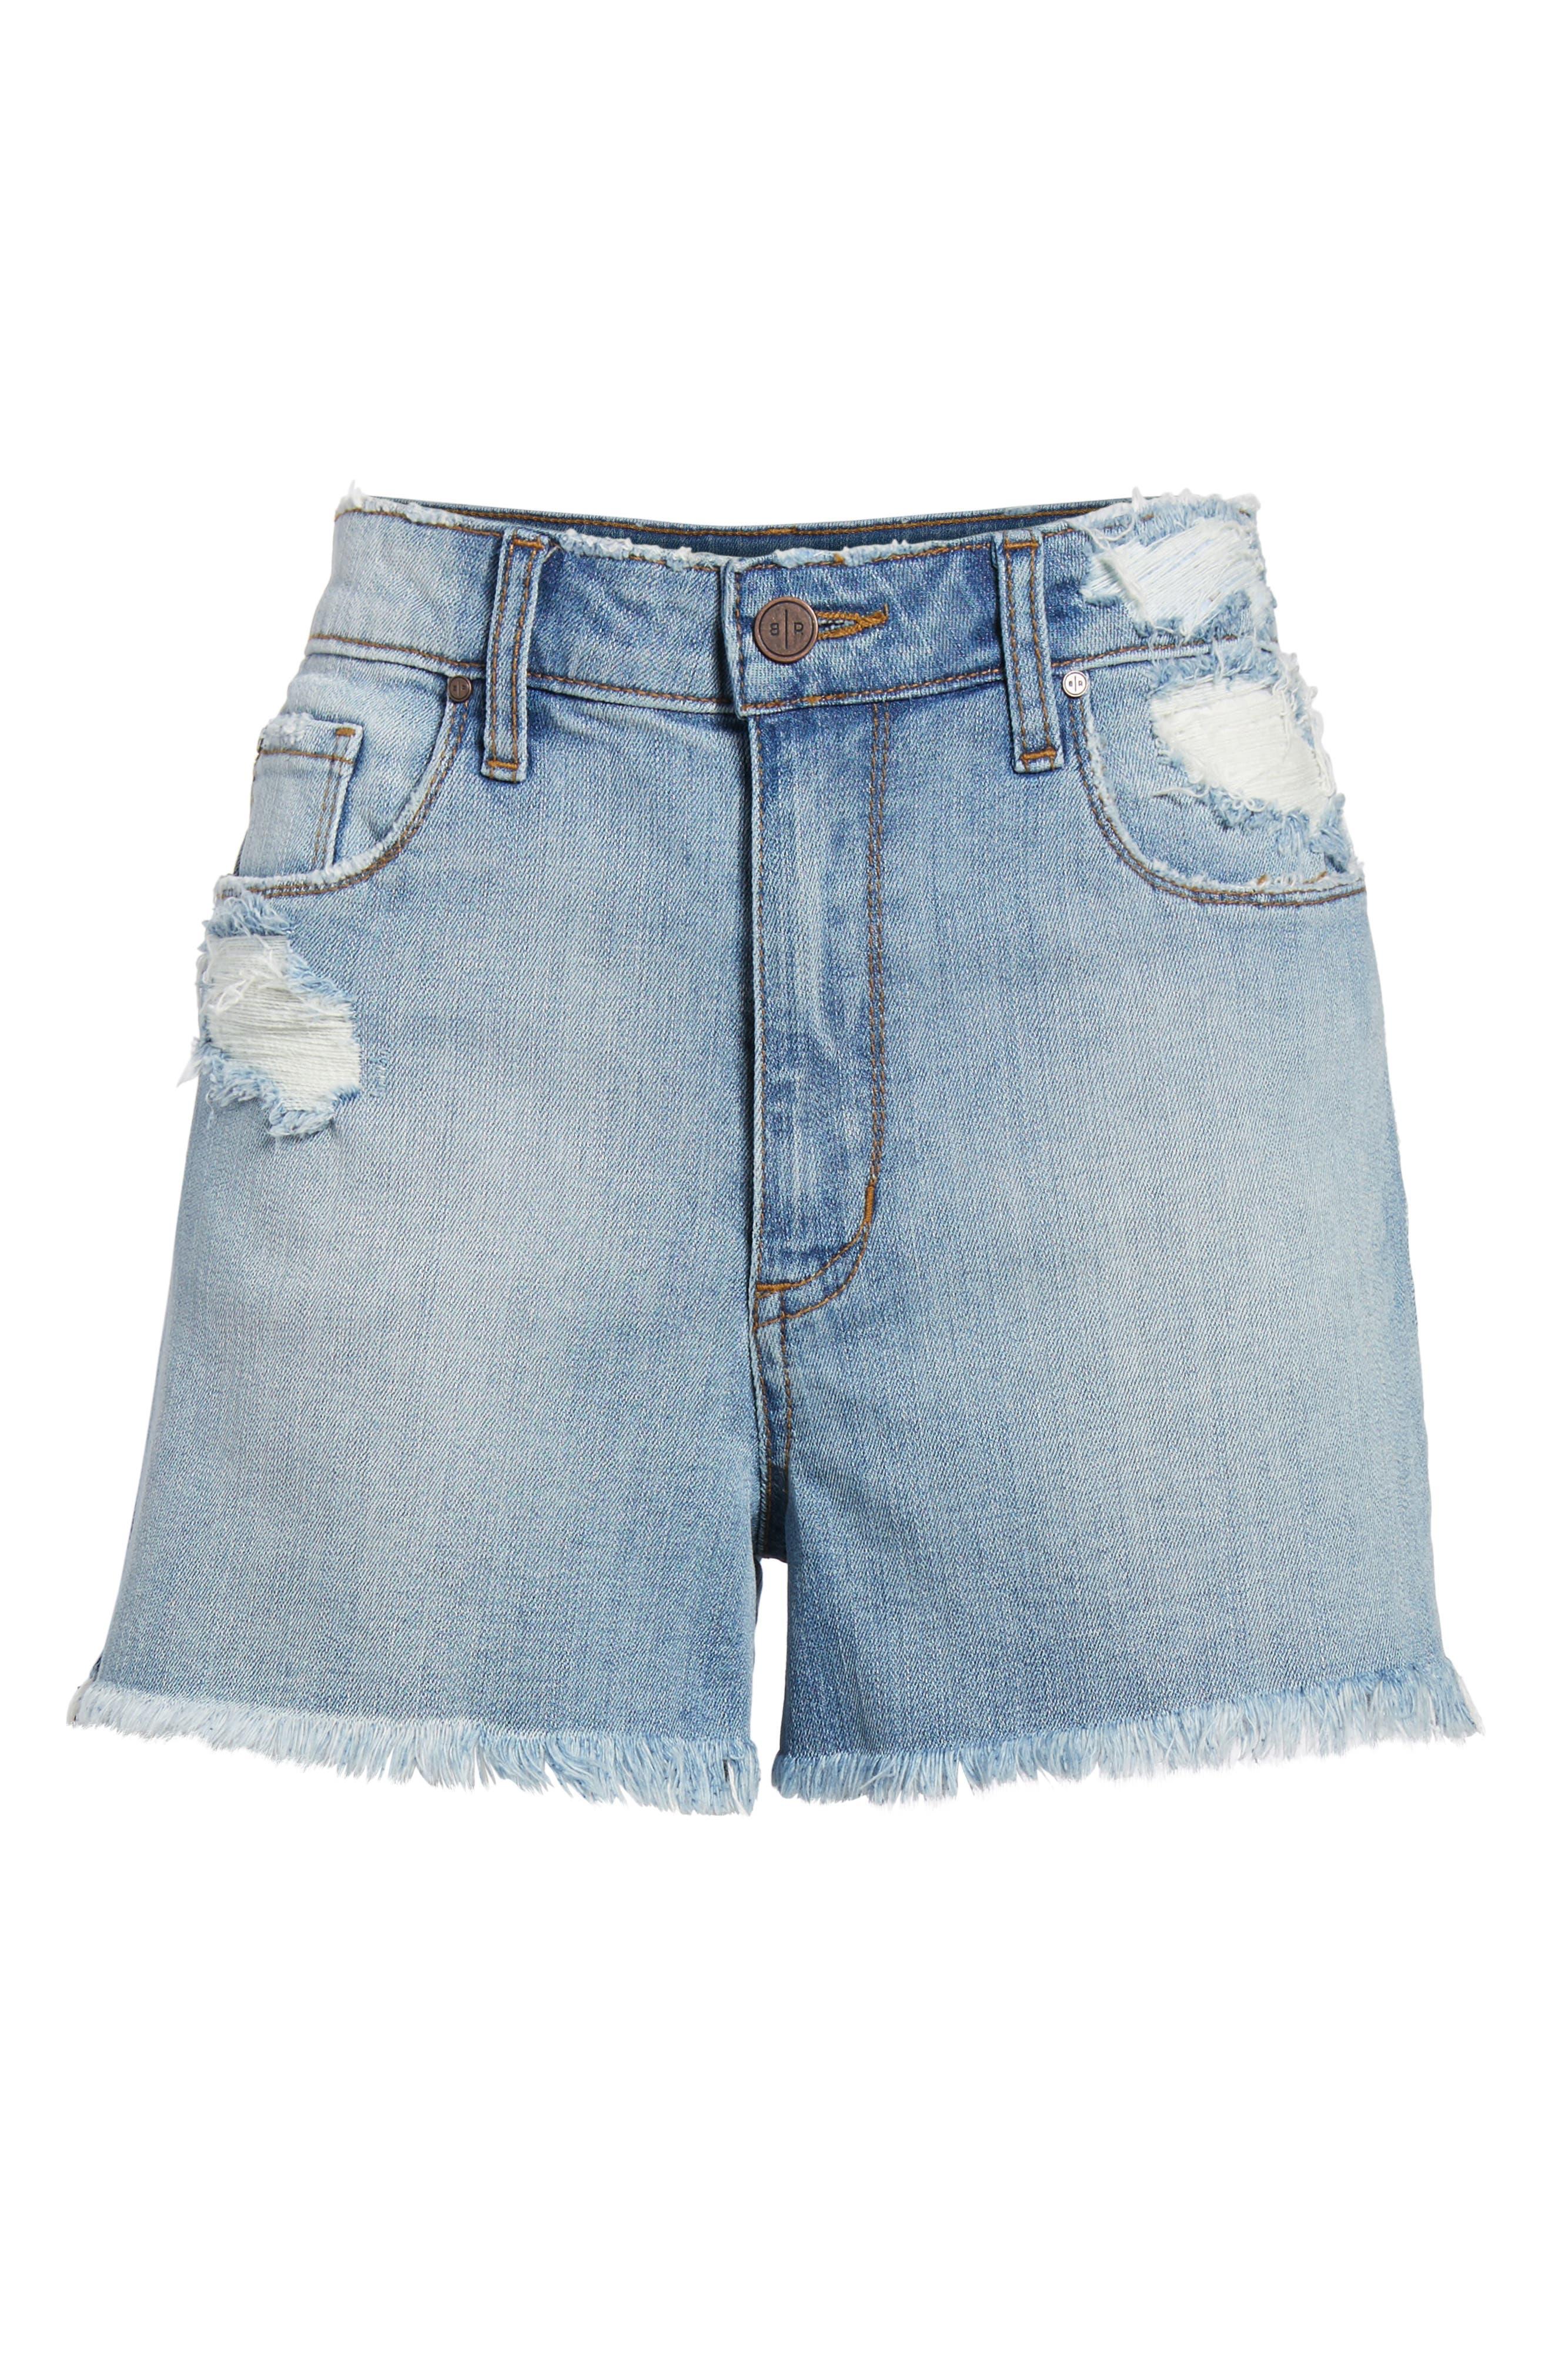 High Waist Distressed Denim Shorts,                             Alternate thumbnail 6, color,                             Medium Wash